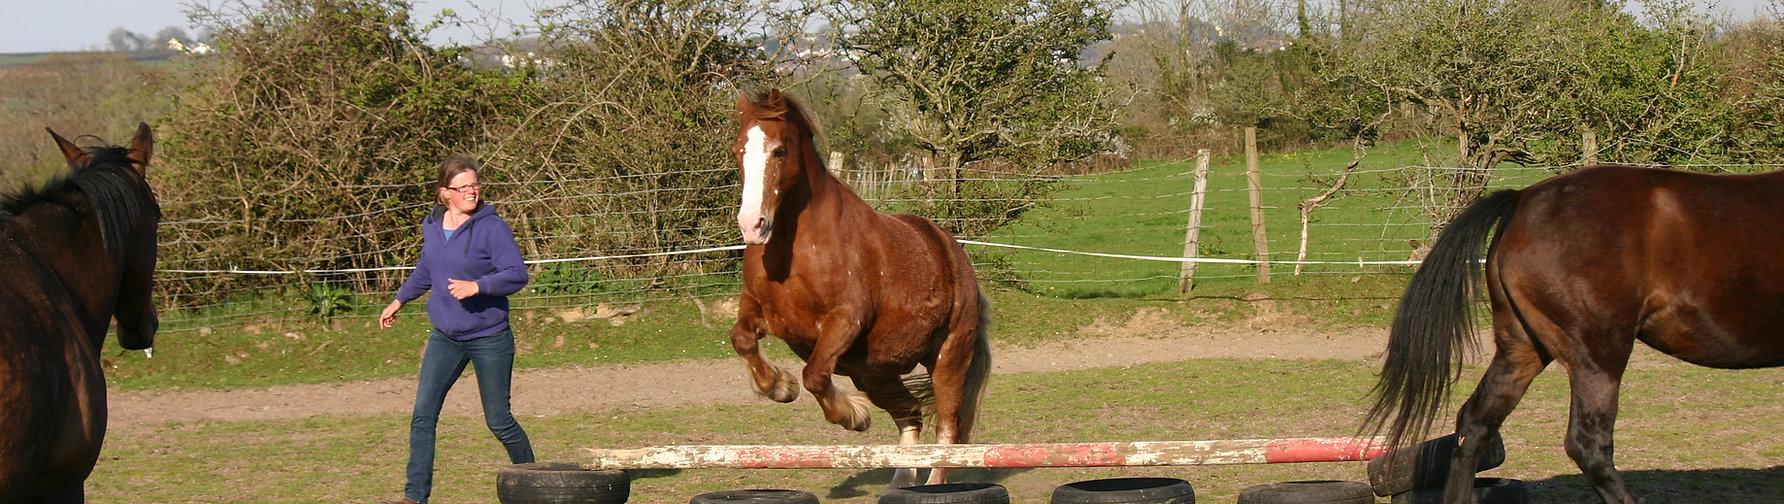 Jenni Nellist Animal Behaviourist, Equine / Horse and Dog Behaviourist South Wales Information for Vets